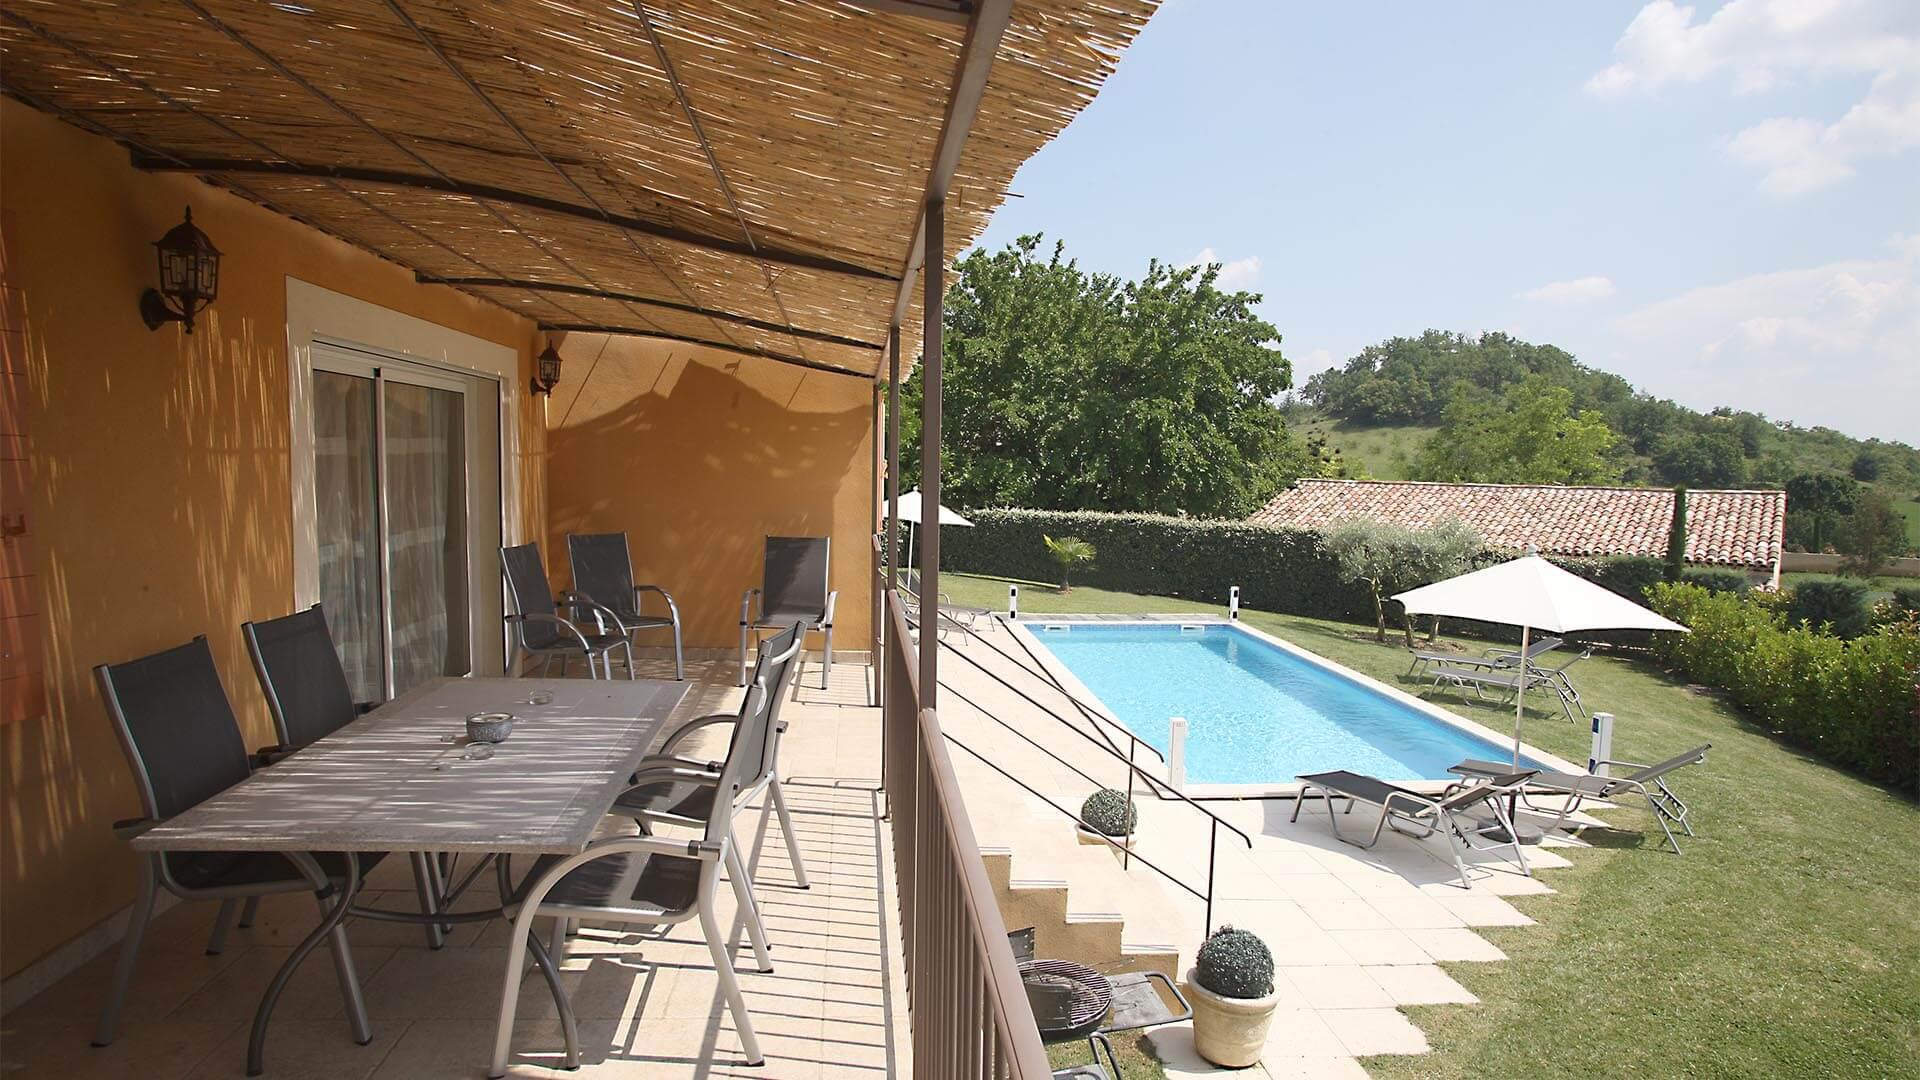 Location villa de vacances Provence | Villa les oliviers | Terrasse, piscine et jardin